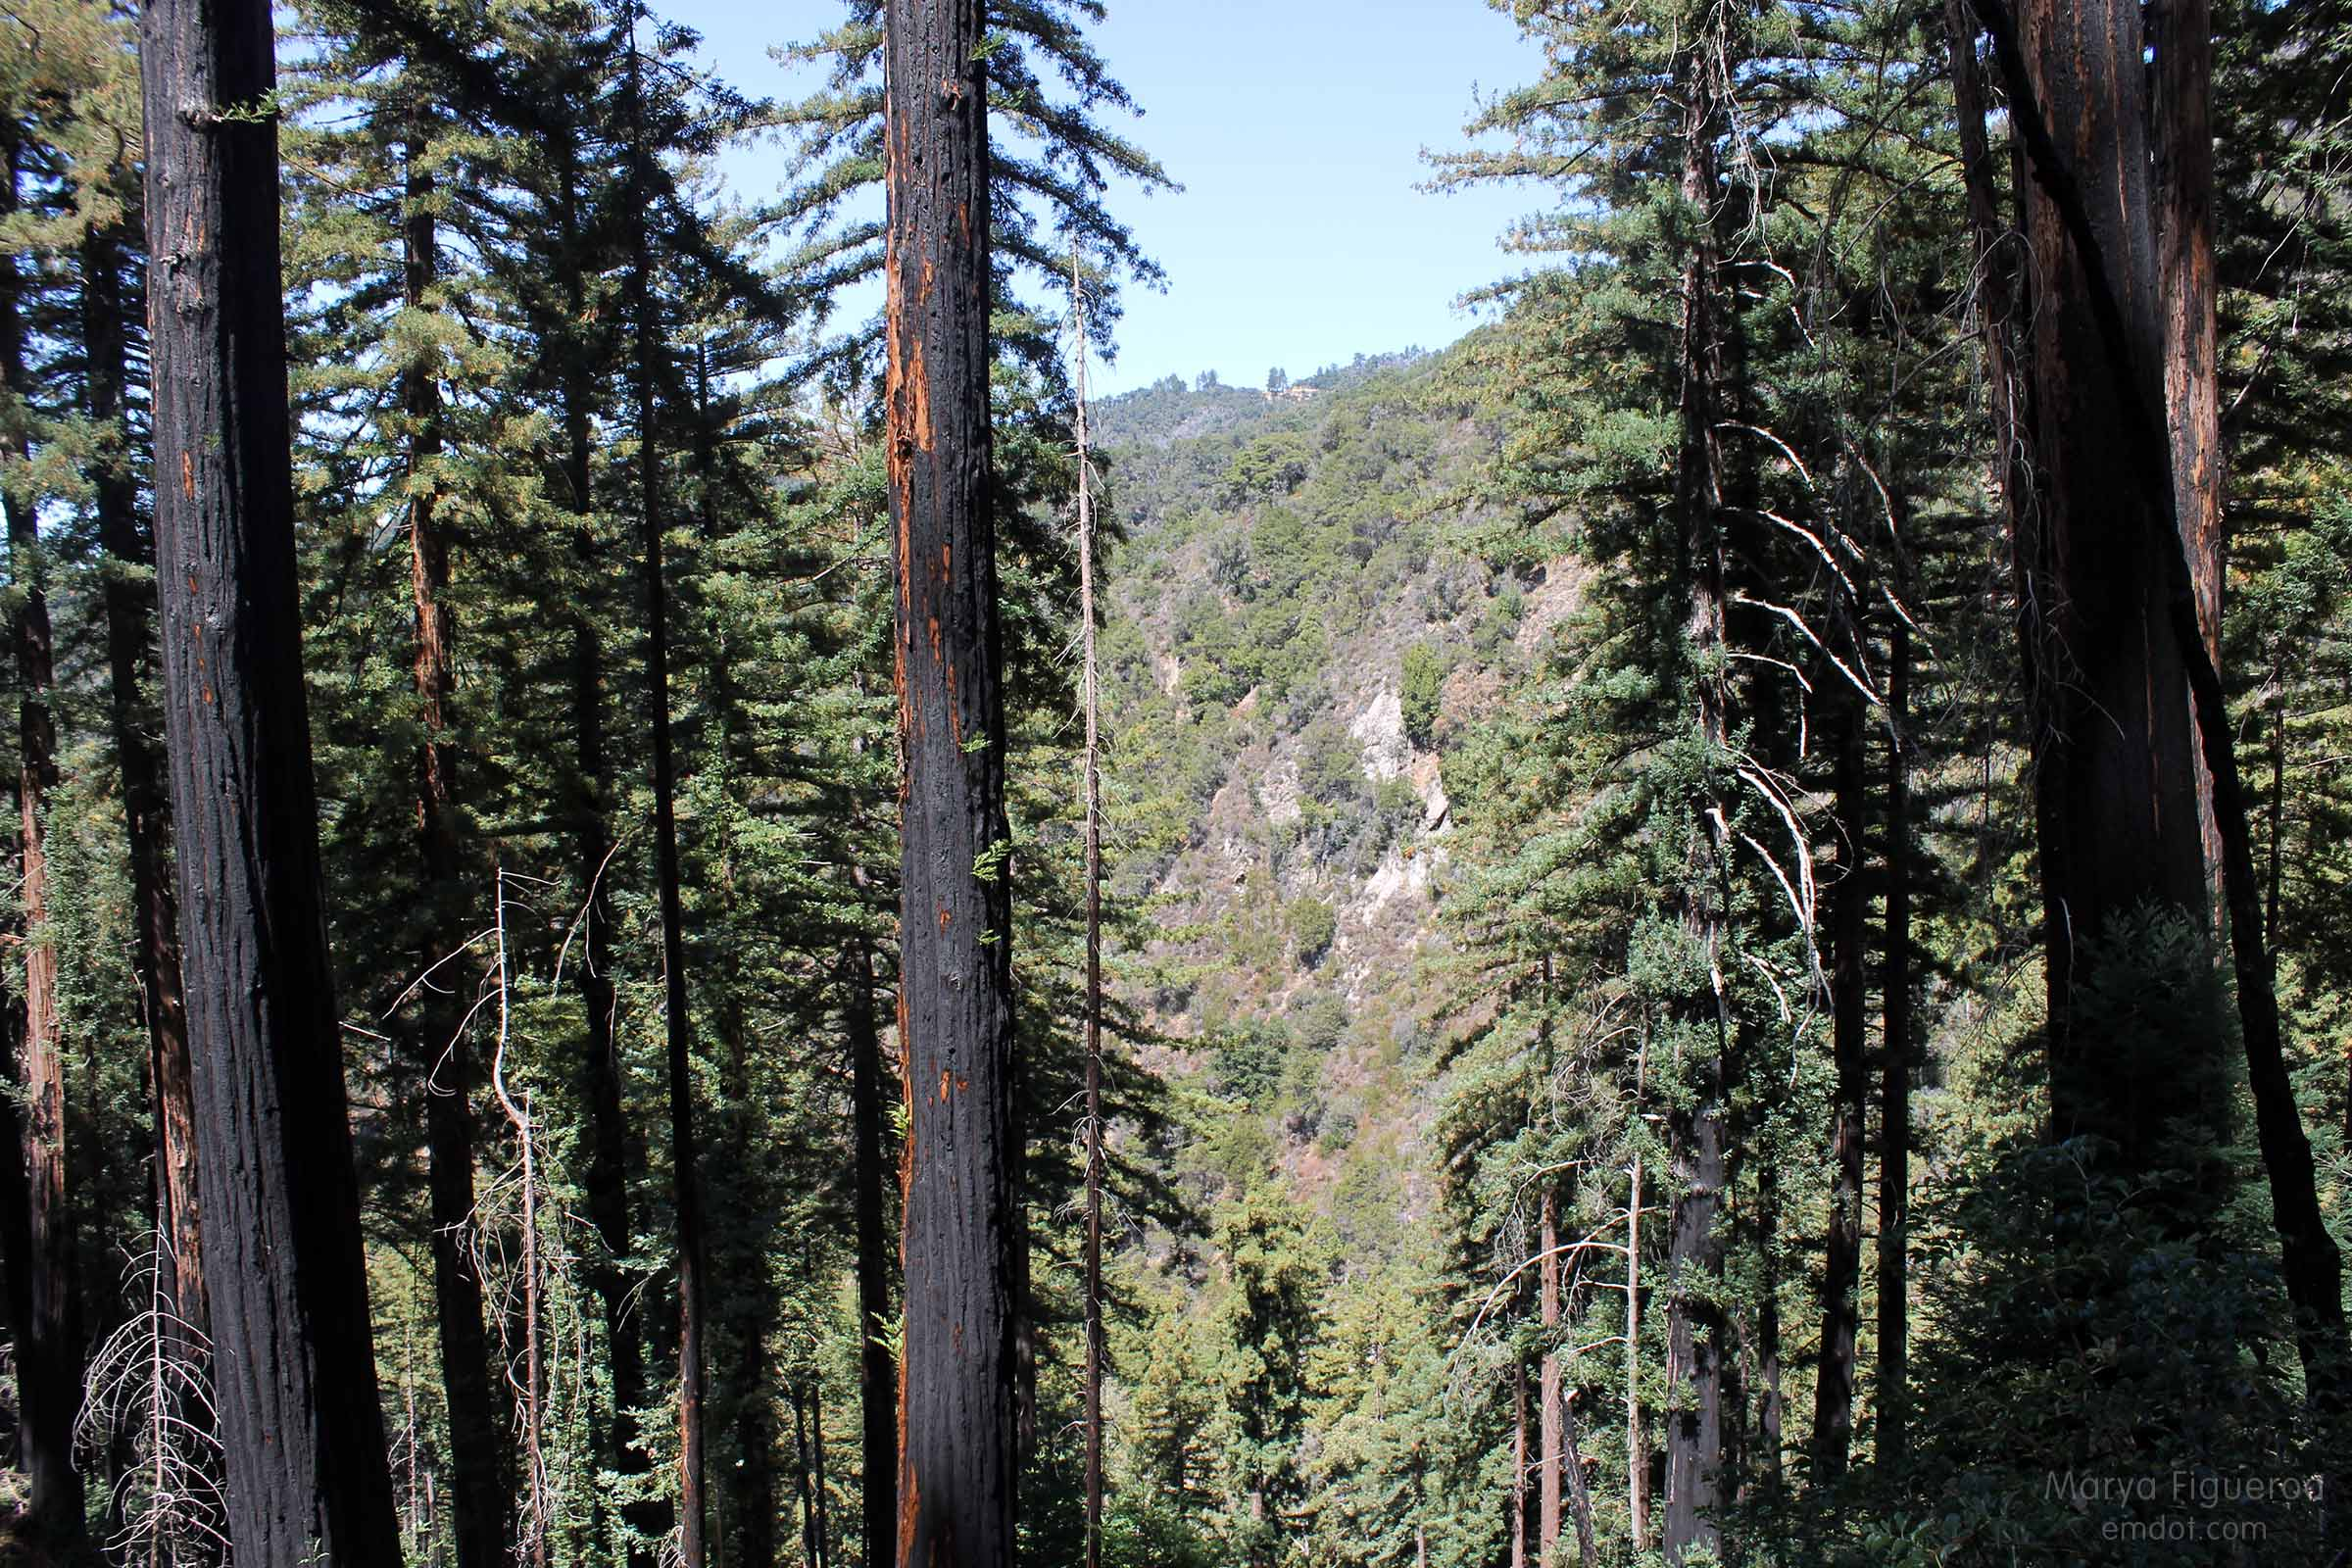 2009 fire burn survivors -- coastal redwood